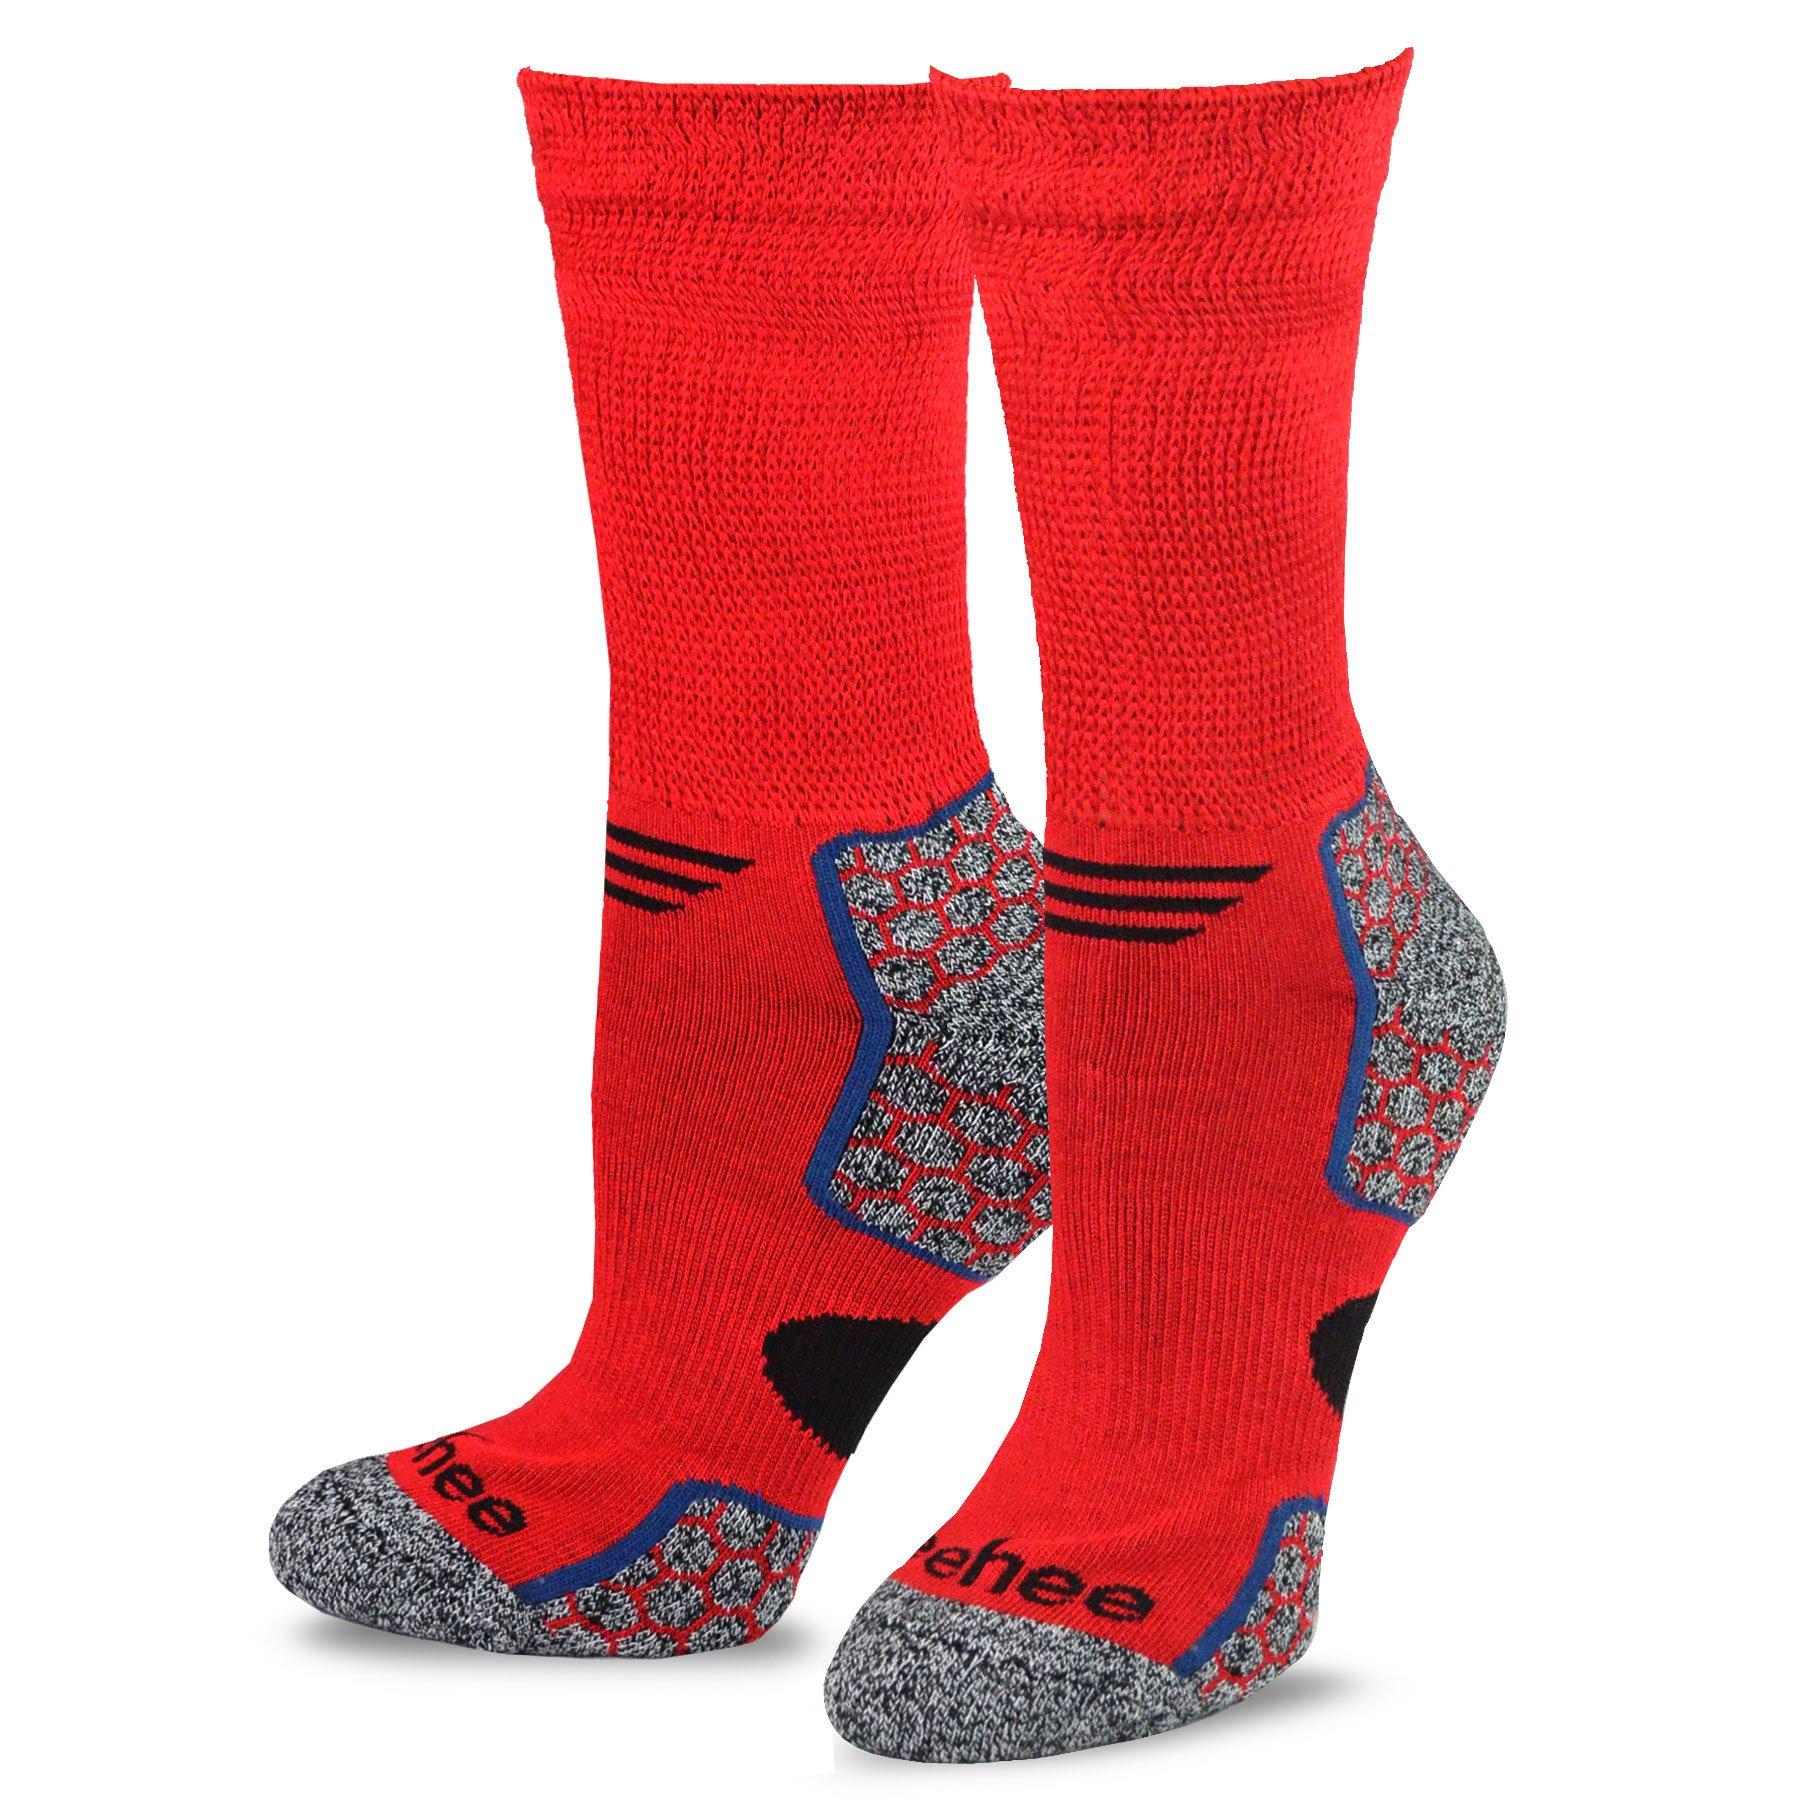 Teehee Viscose From Bamboo Diabetic Crew Socks 3 Pack